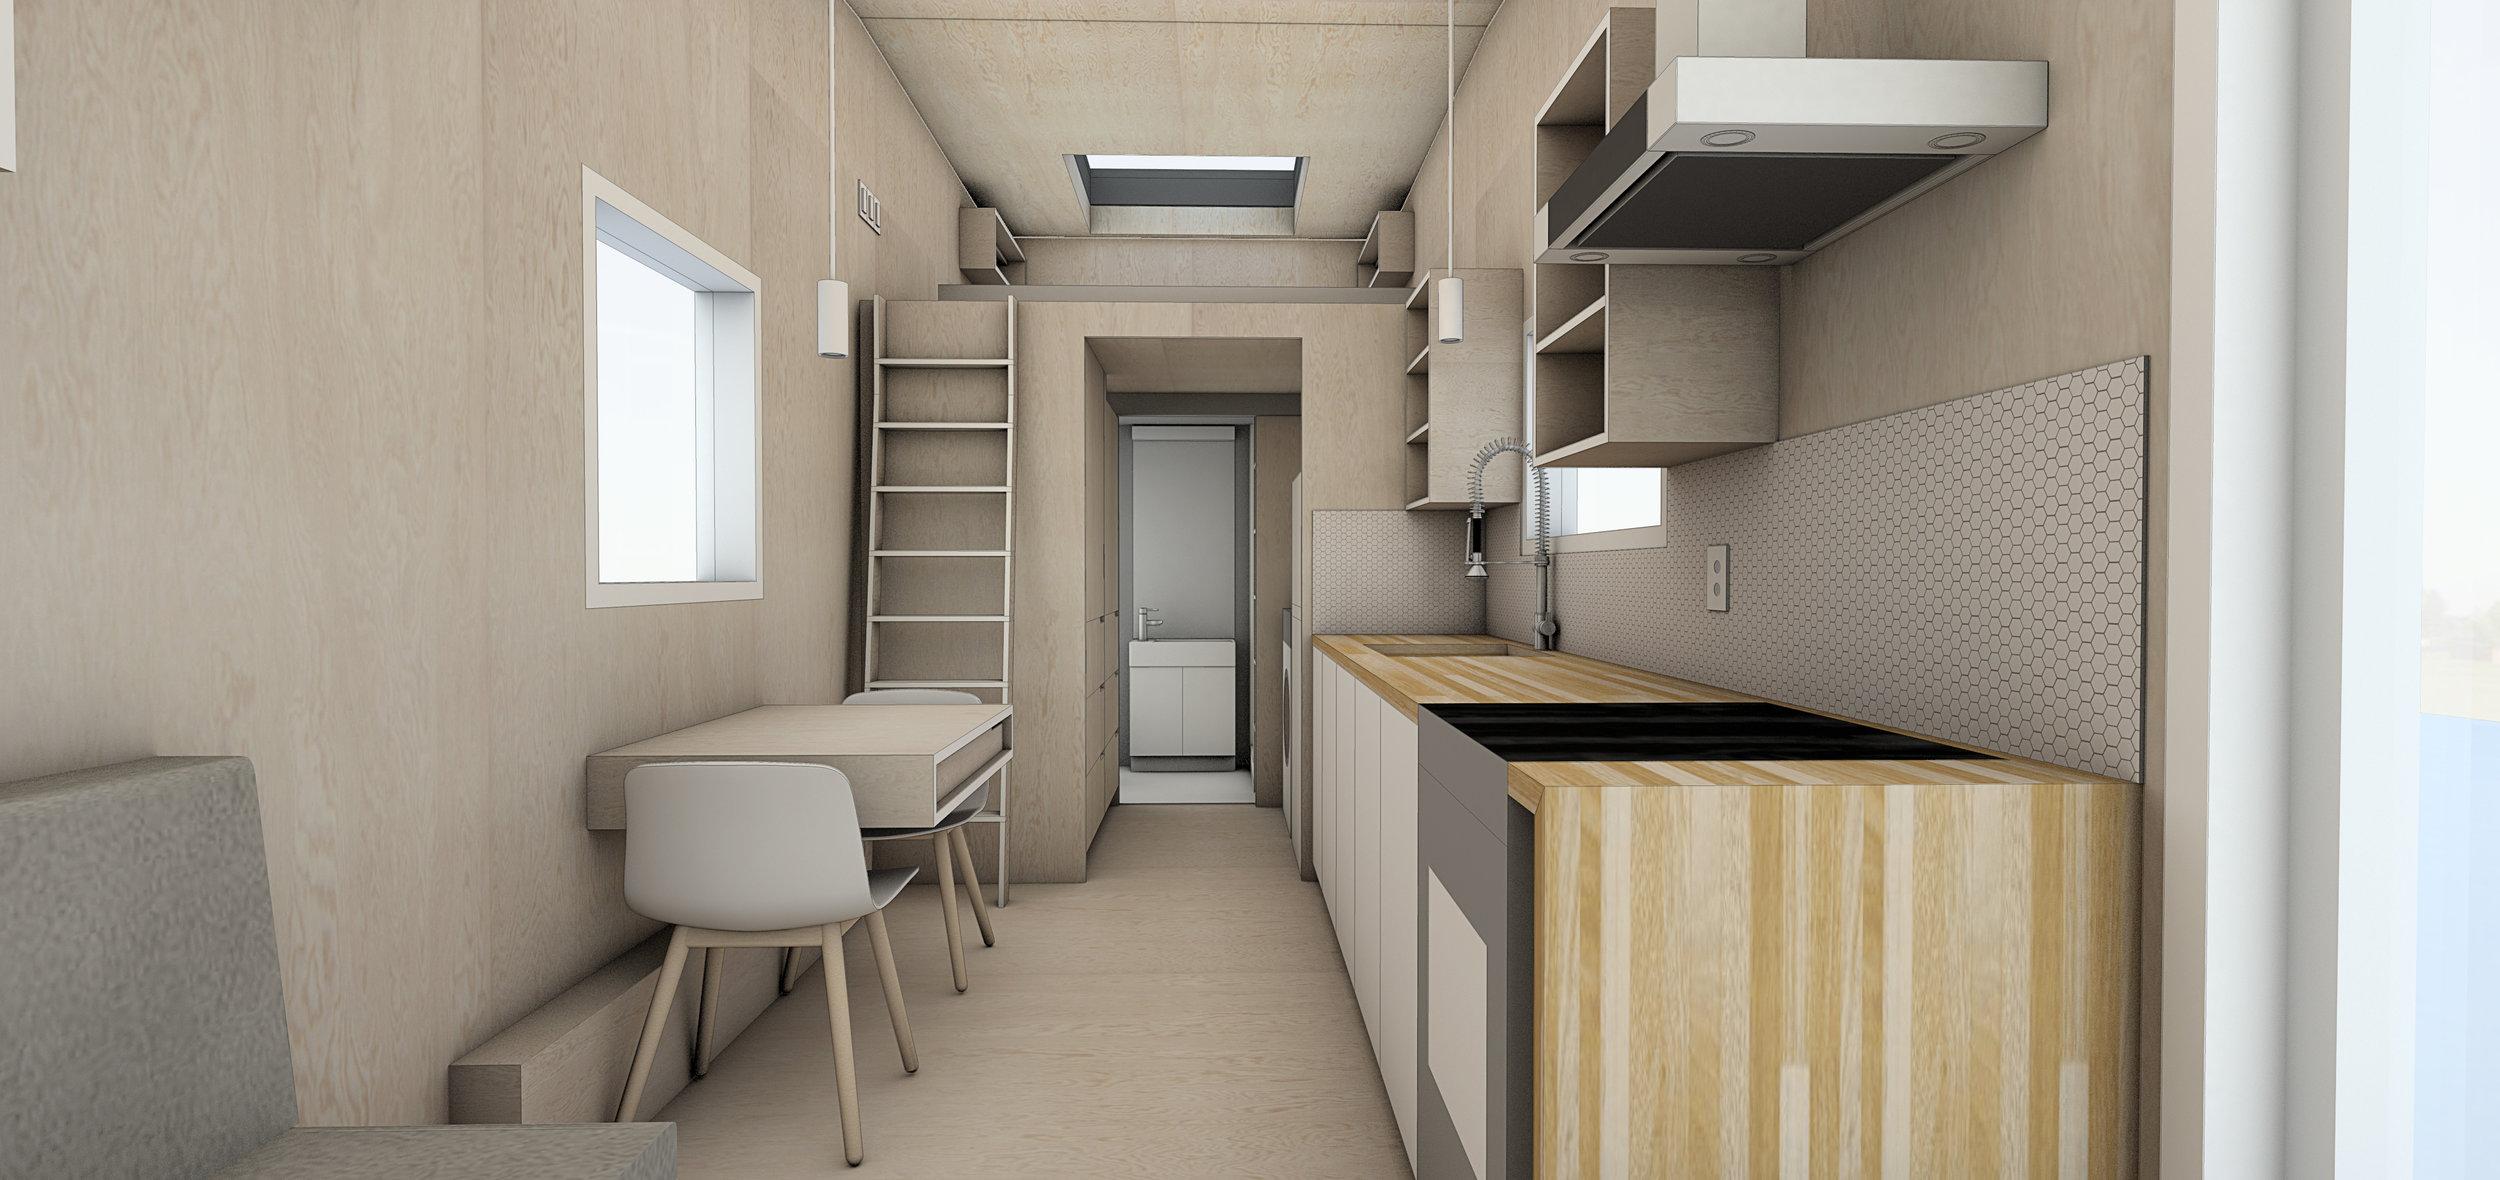 170126_TINY+HOUSE+INTERIOR+RENDER.jpg